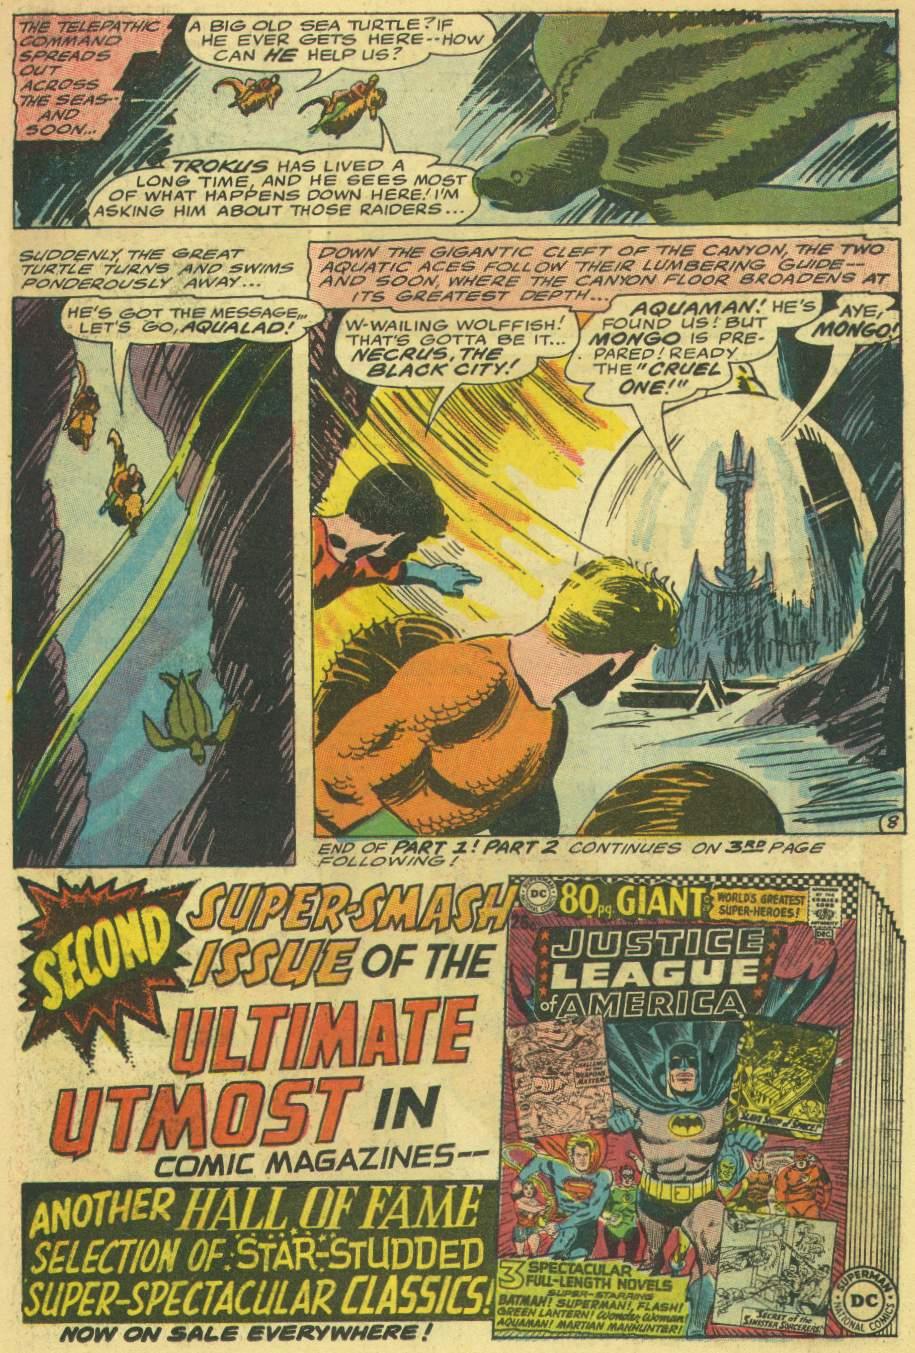 Aquaman y Aqualad encontrando la ciudad de Necrus en Aquaman #30 (diciembre de 1966). Imagen: zipcomic.com